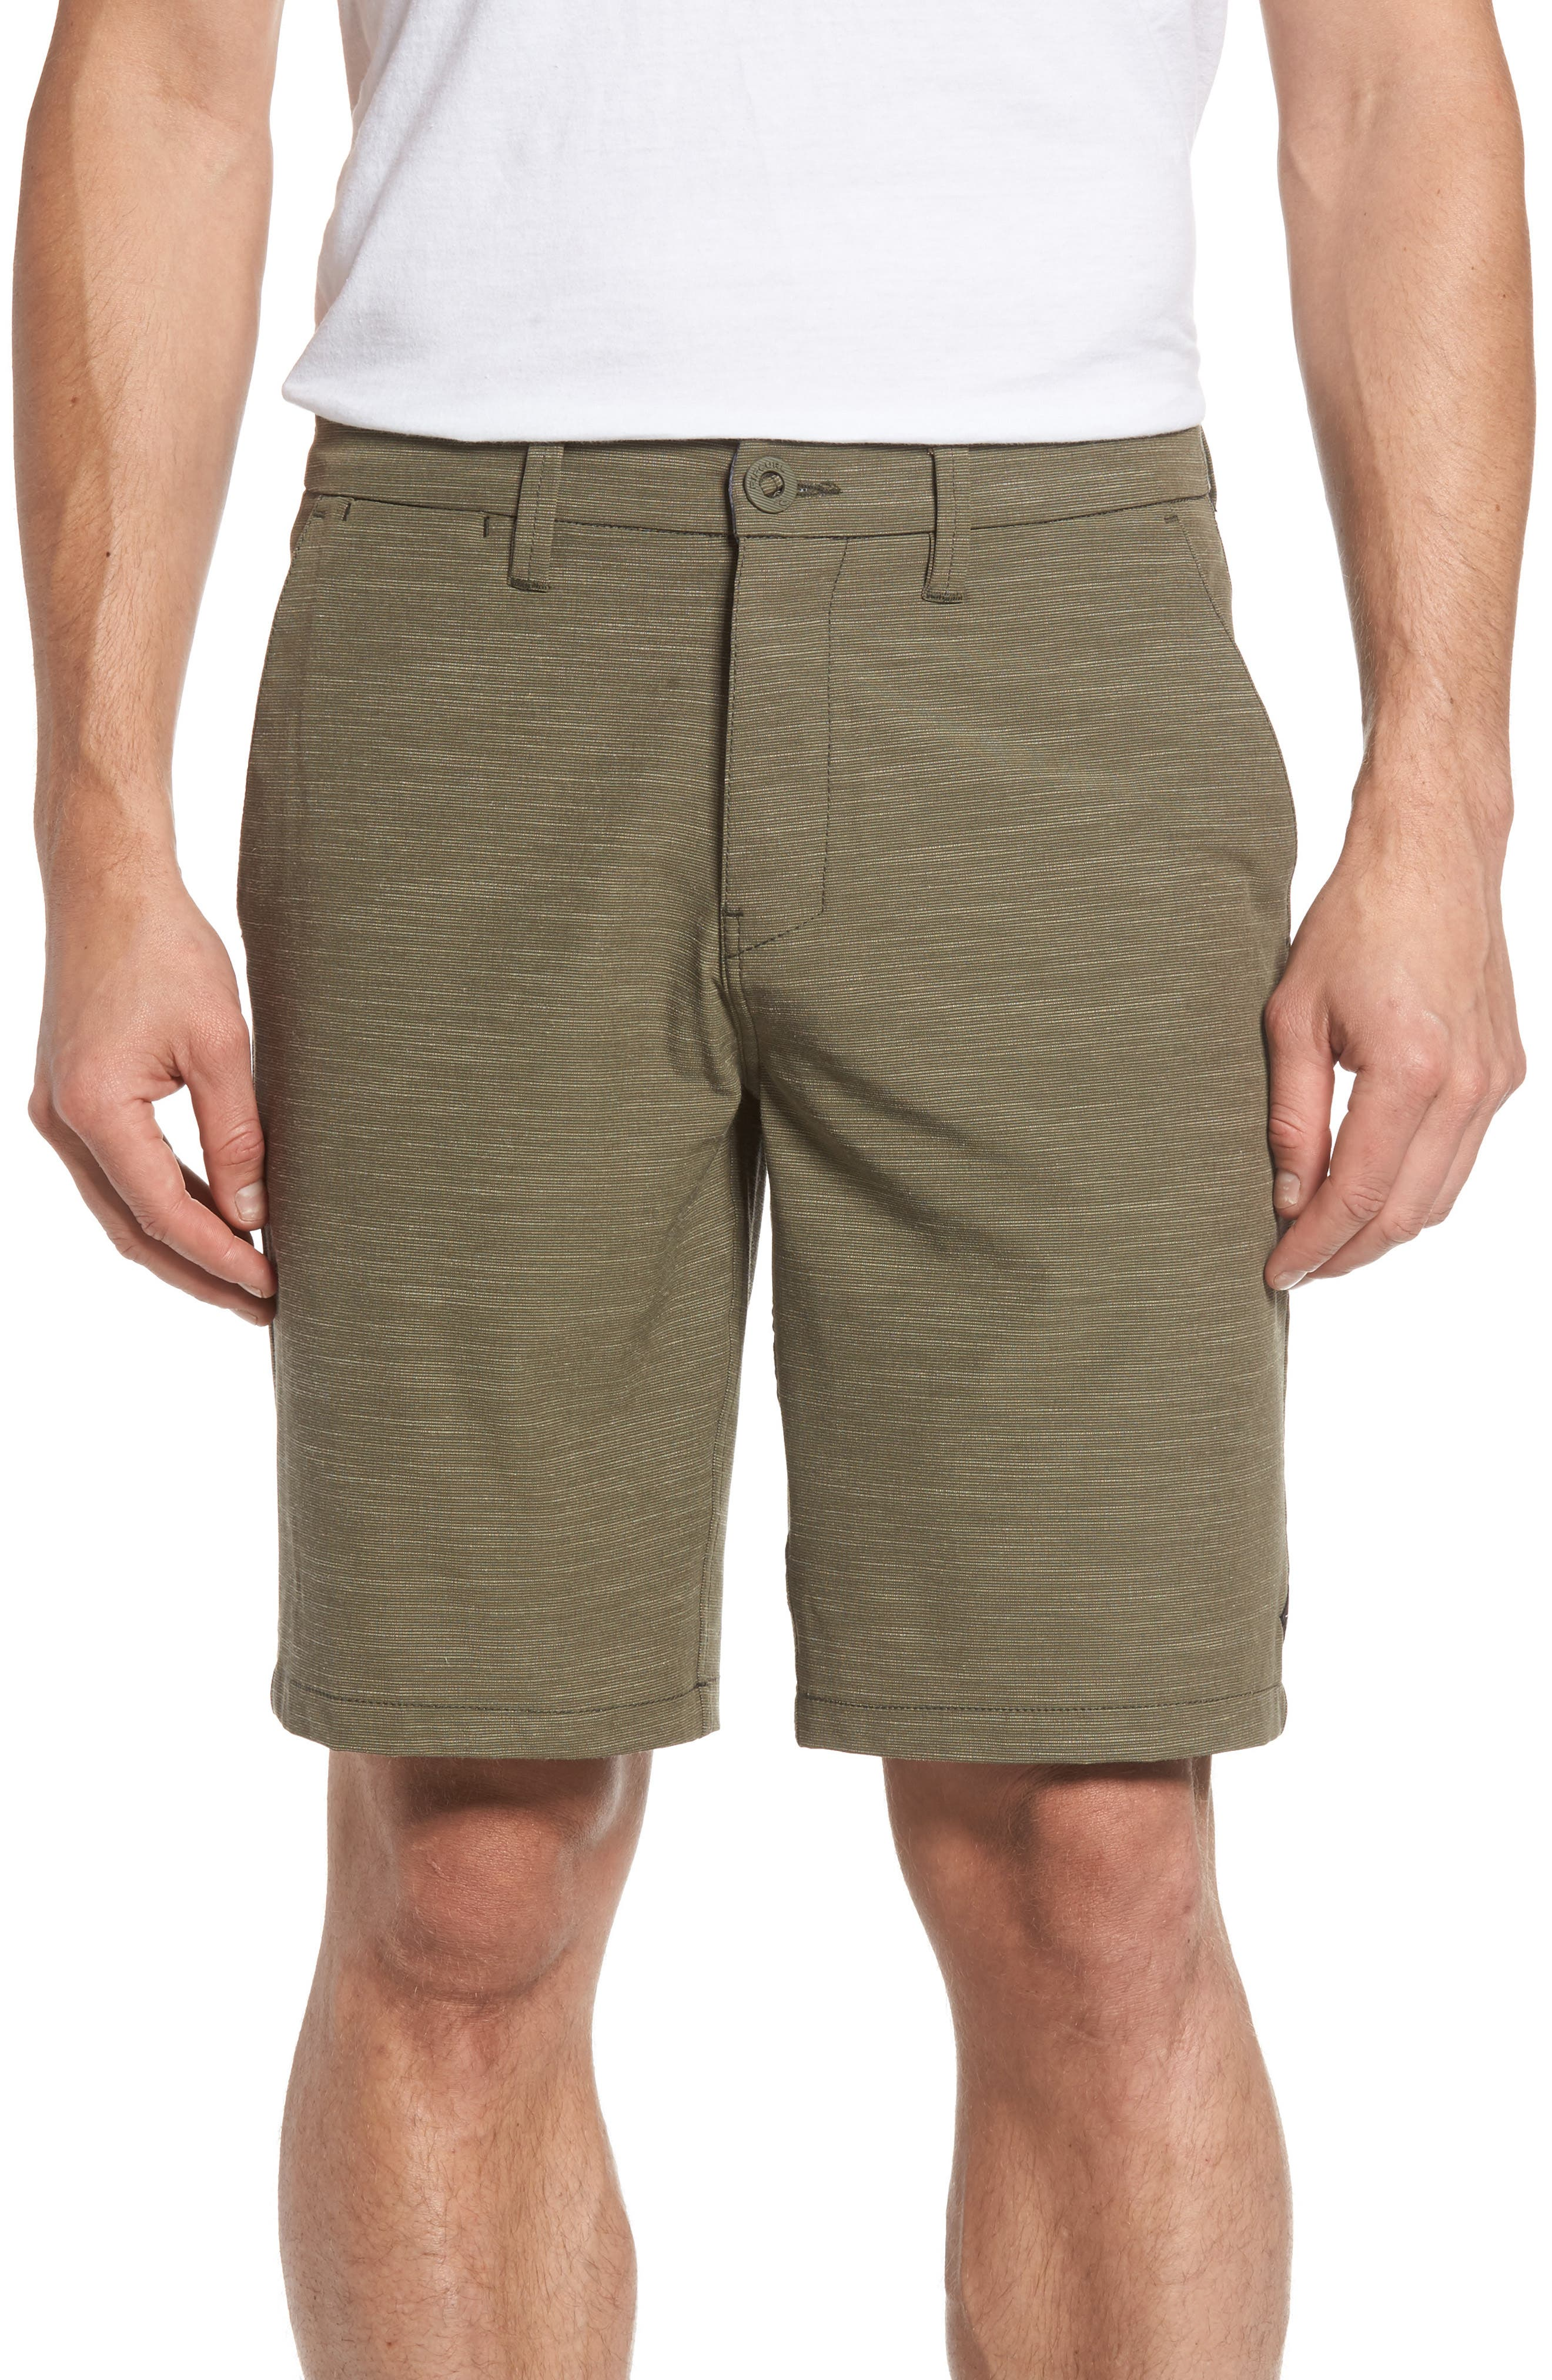 Rip Curl Mirage Jackson Boardwalk Hybrid Shorts